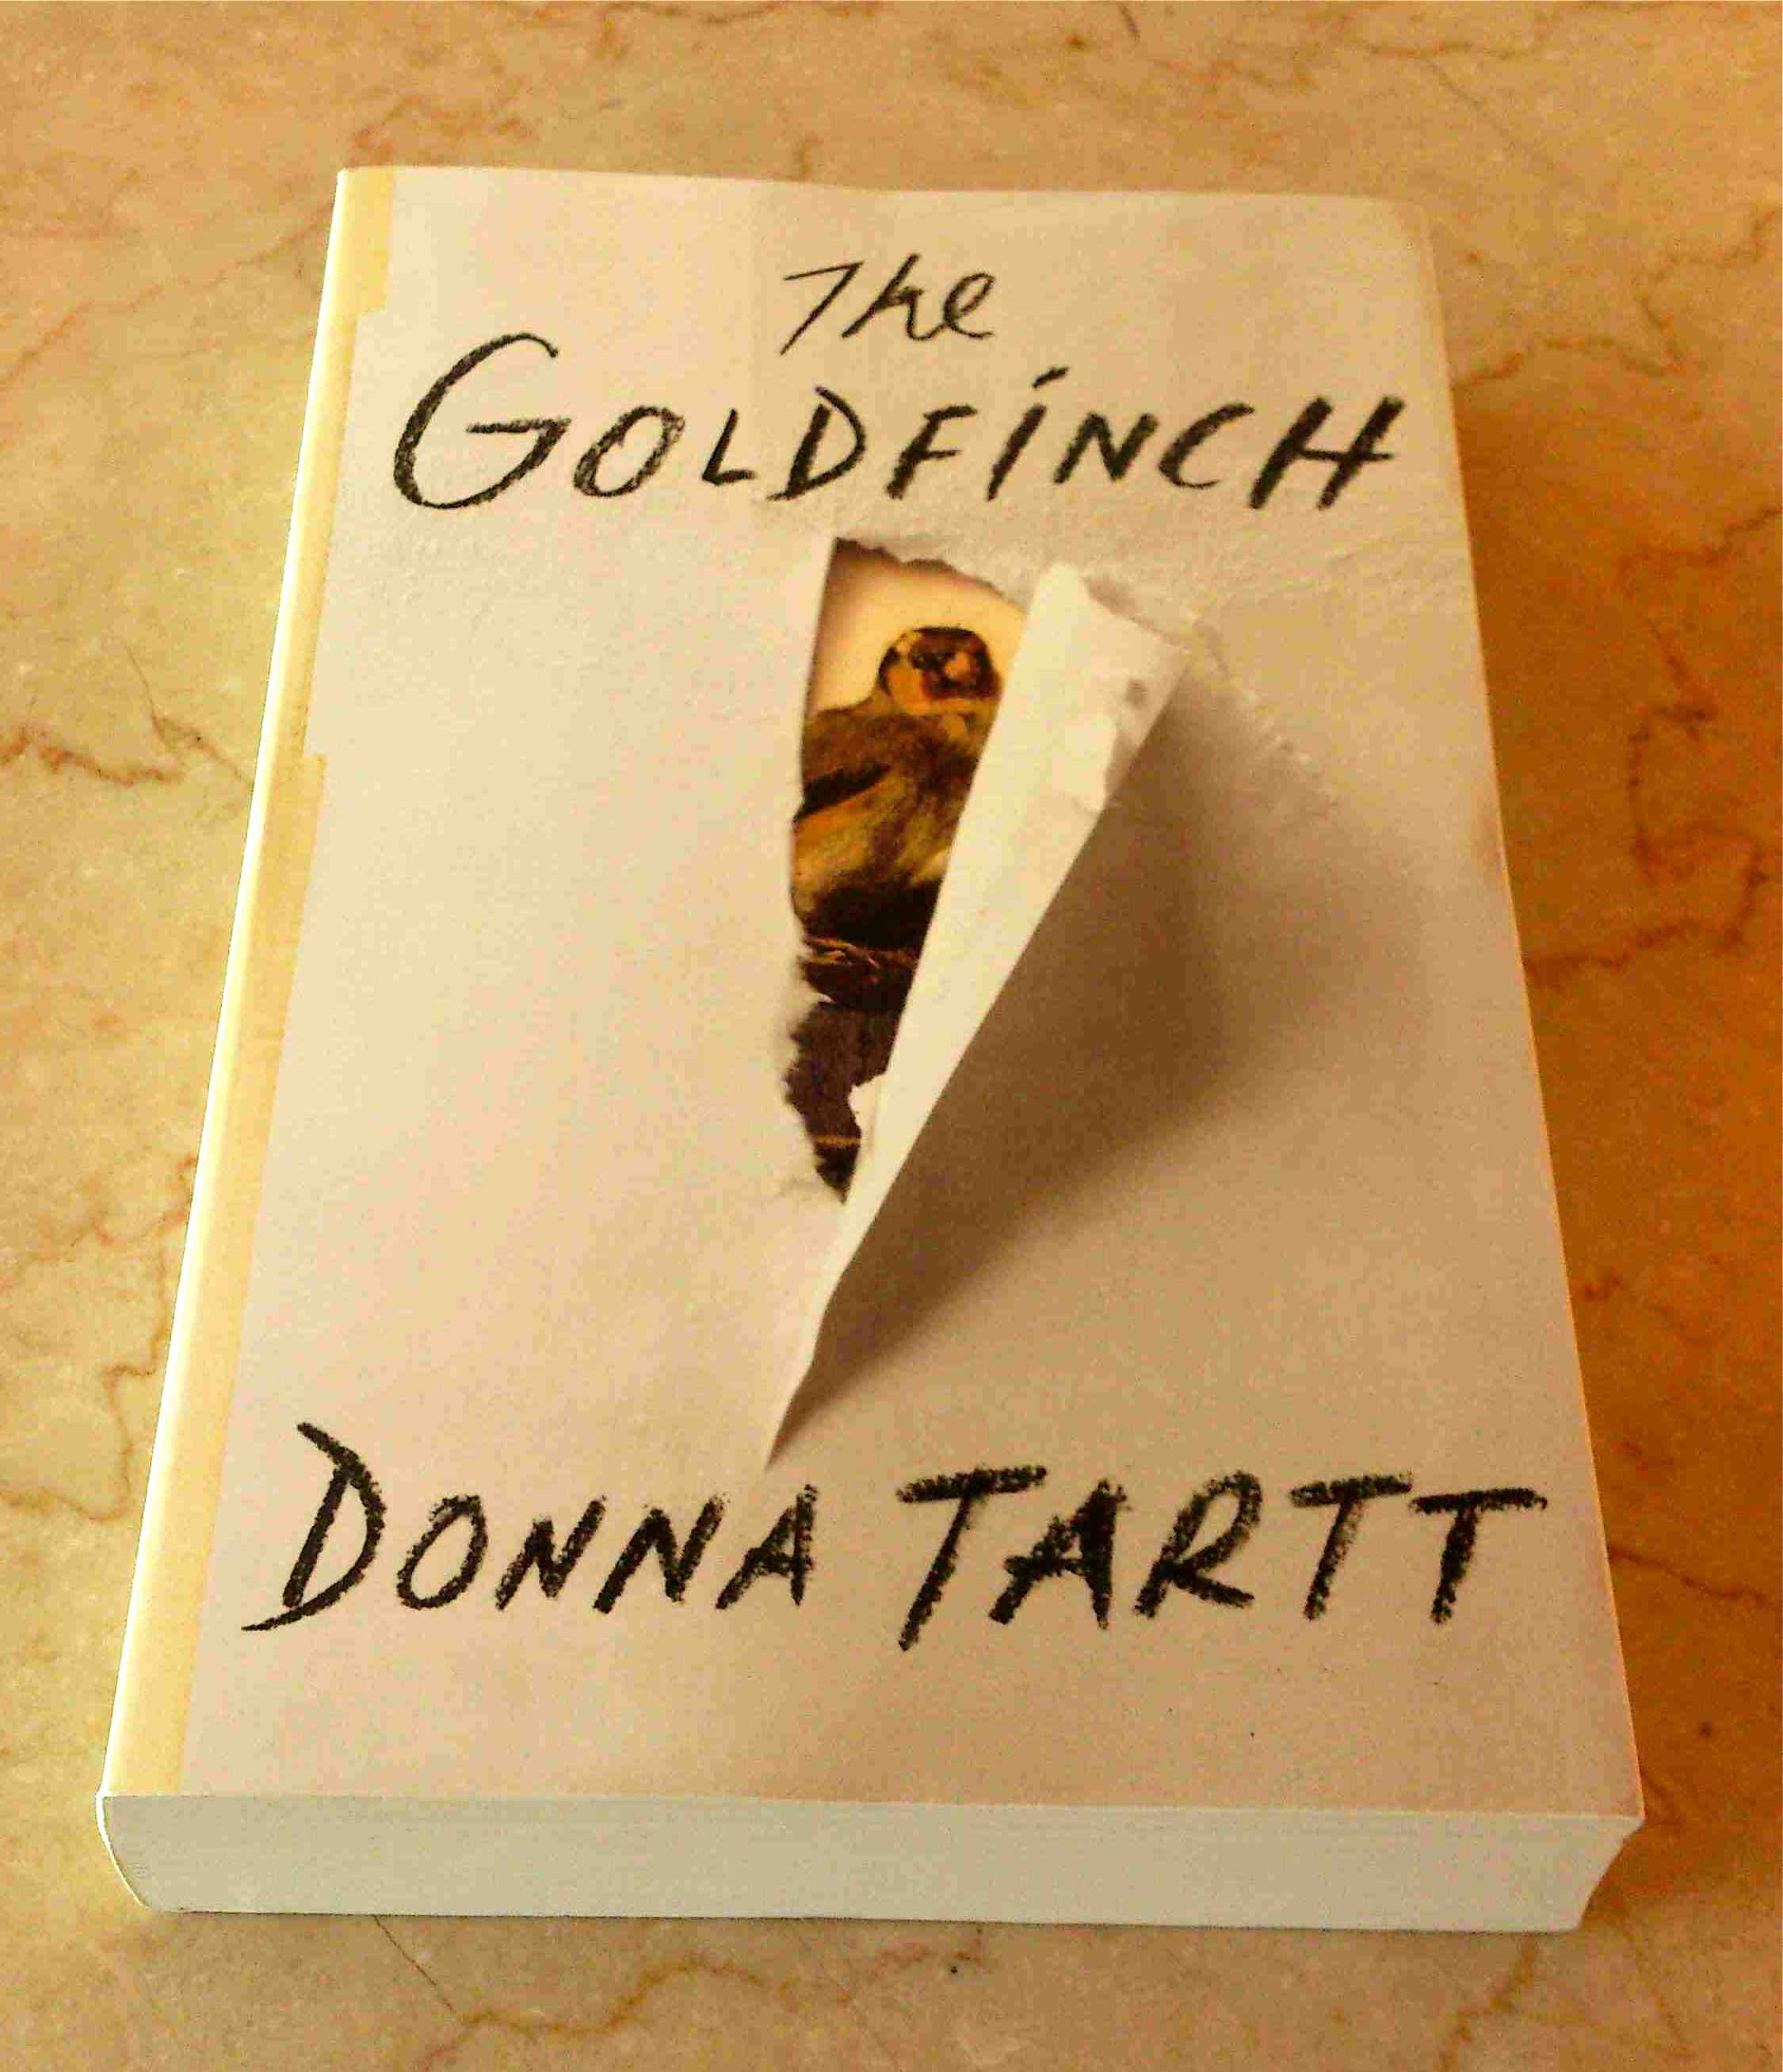 Donna_Tartt_The_Goldfinch